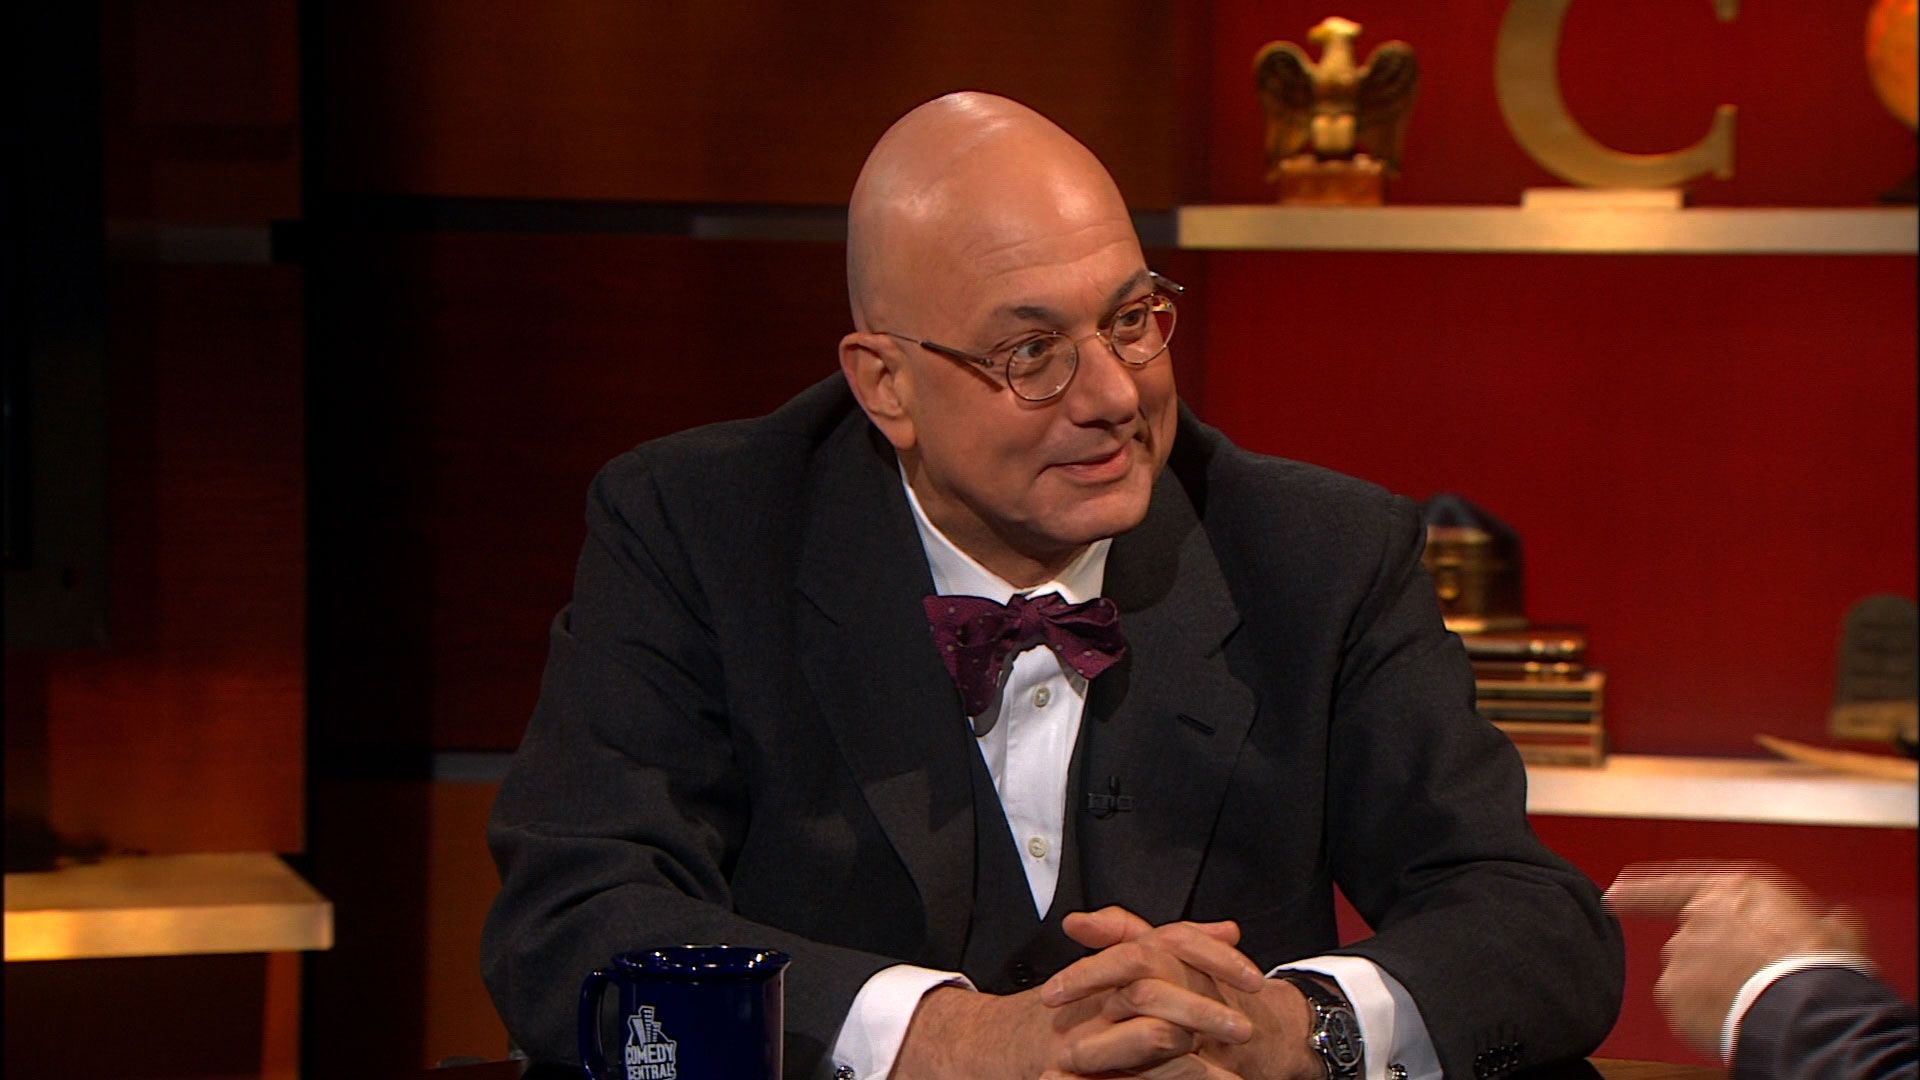 Leon Botstein - The Colbert Report (Video Clip) | Comedy